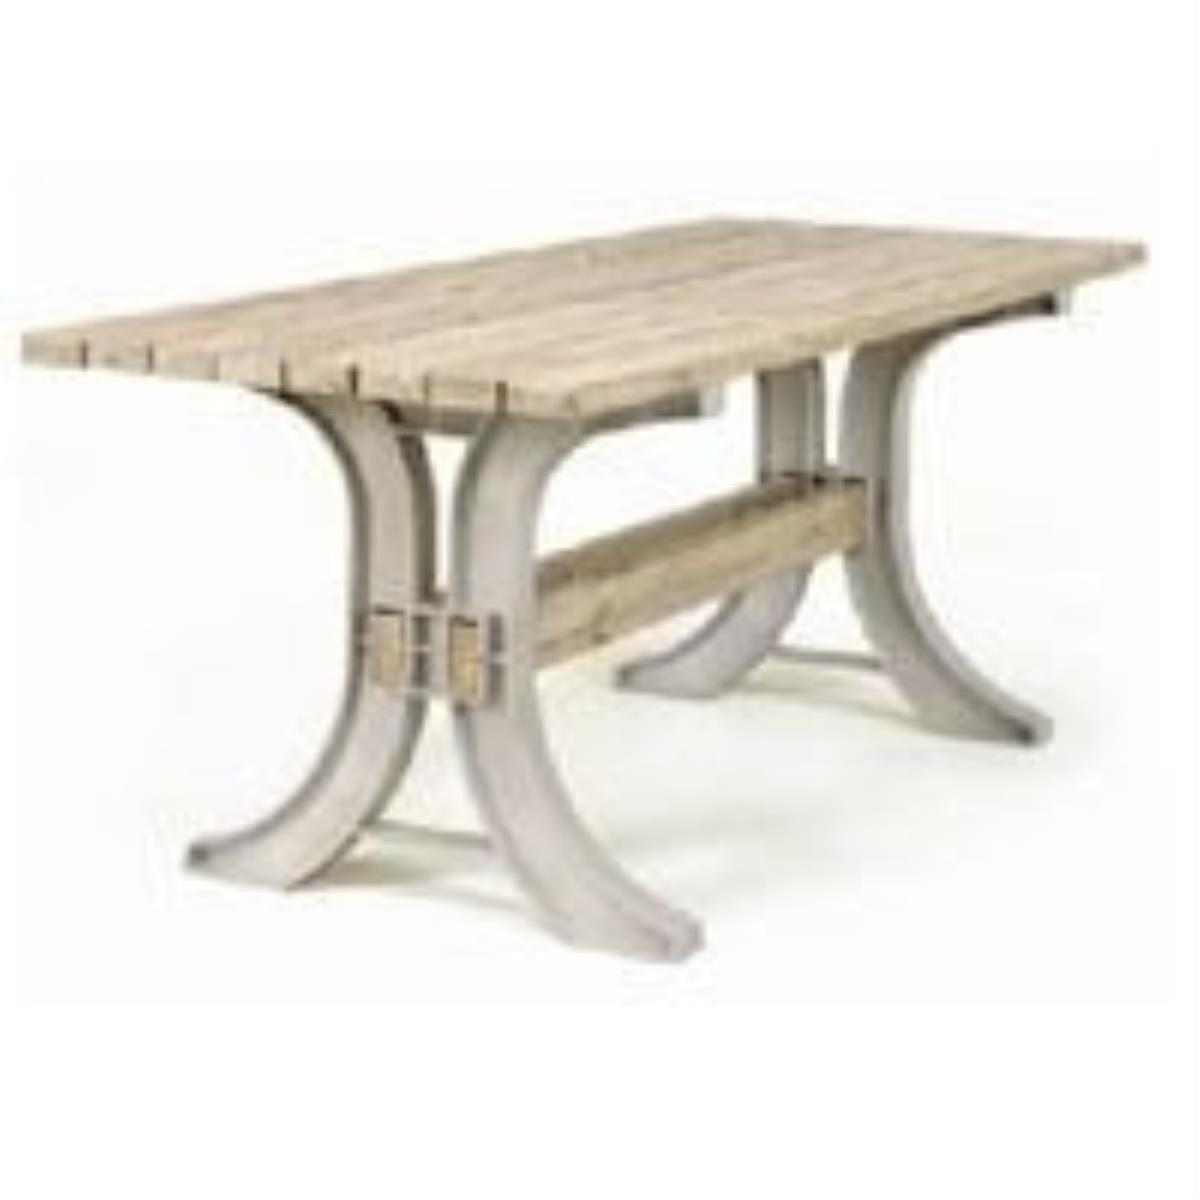 2x4 Basics AnySize Patio Table Set